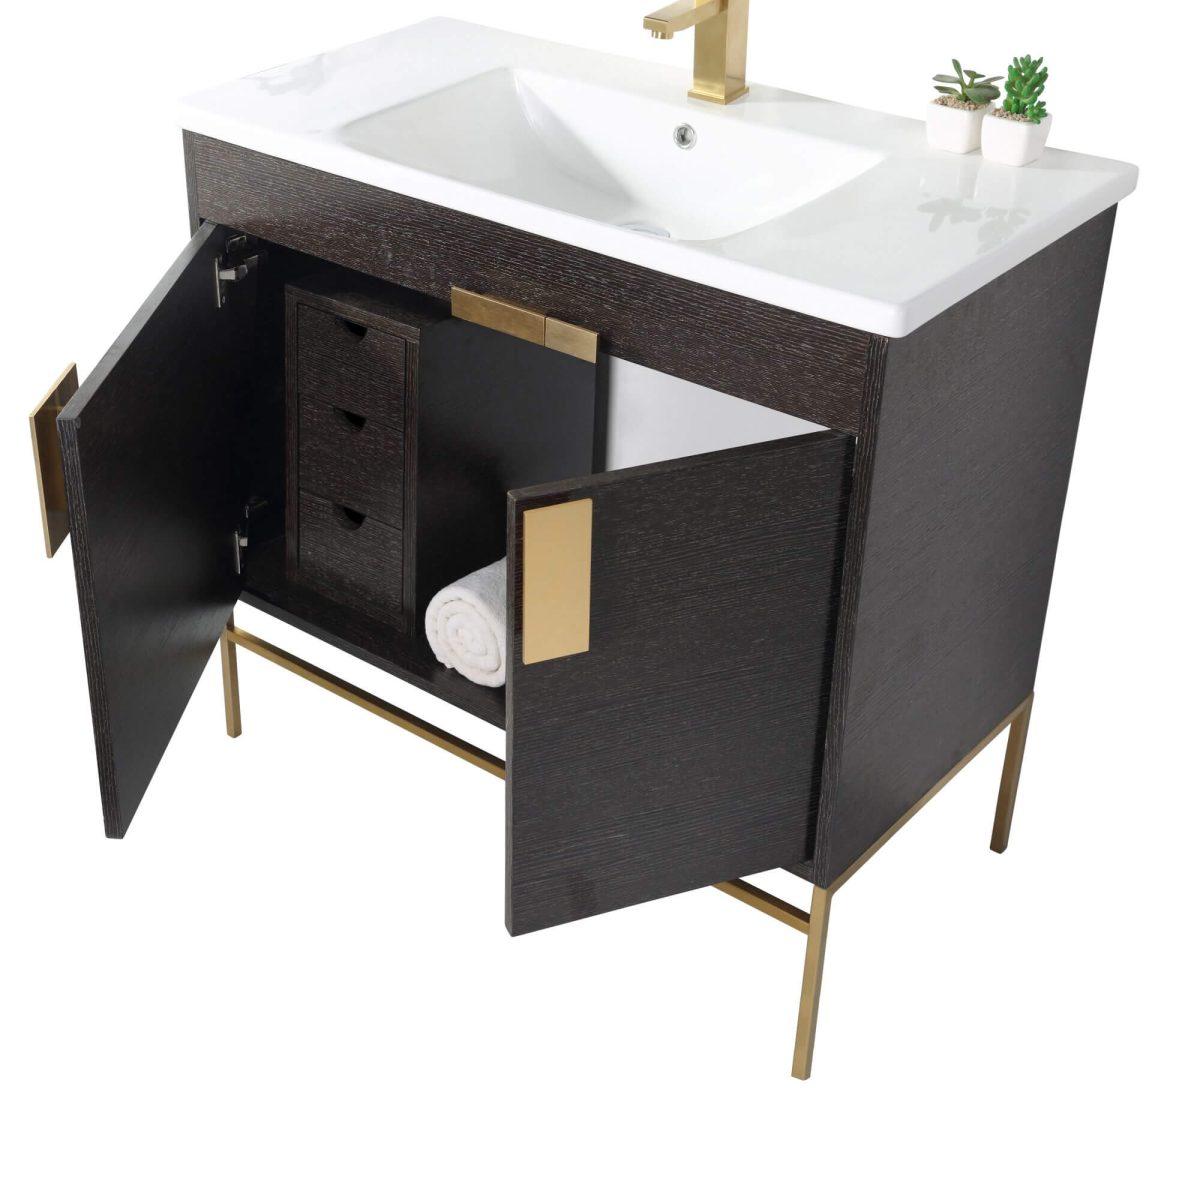 "Shawbridge 36"" Modern Bathroom Vanity  Black Oak Straight Grain with Satin Brass Hardware"